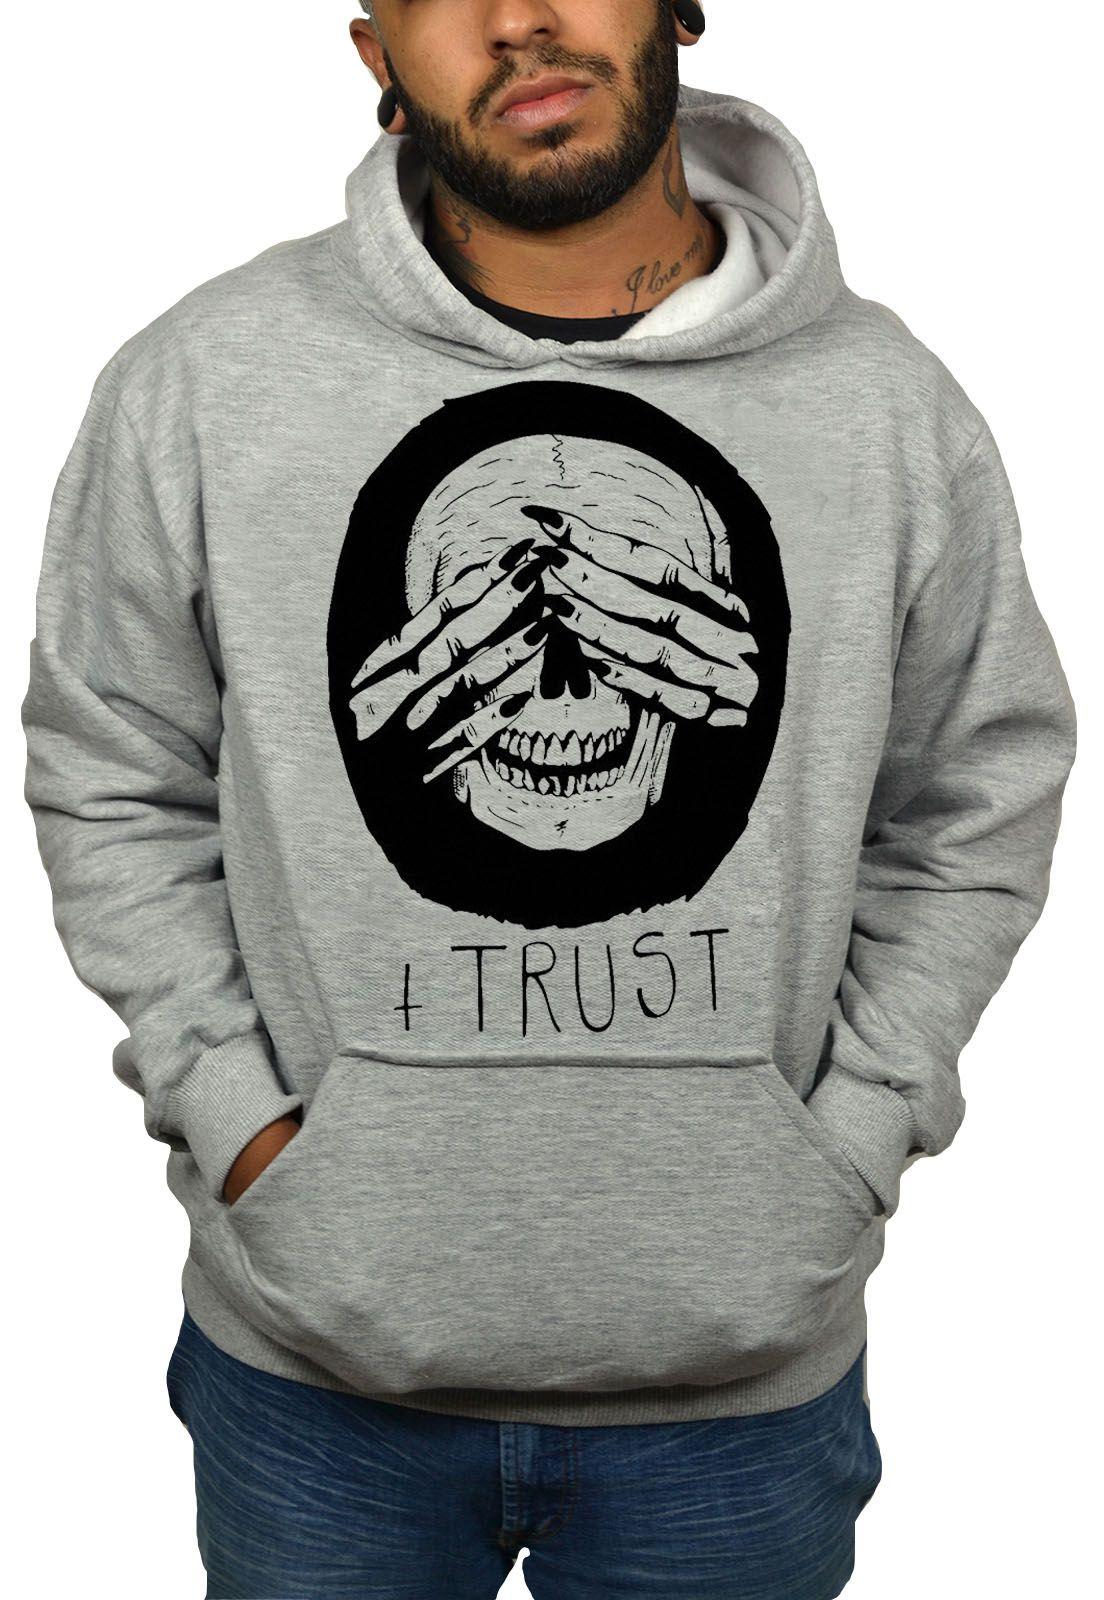 Moletom Hshop Trust Me - Cinza Mescla  - HShop